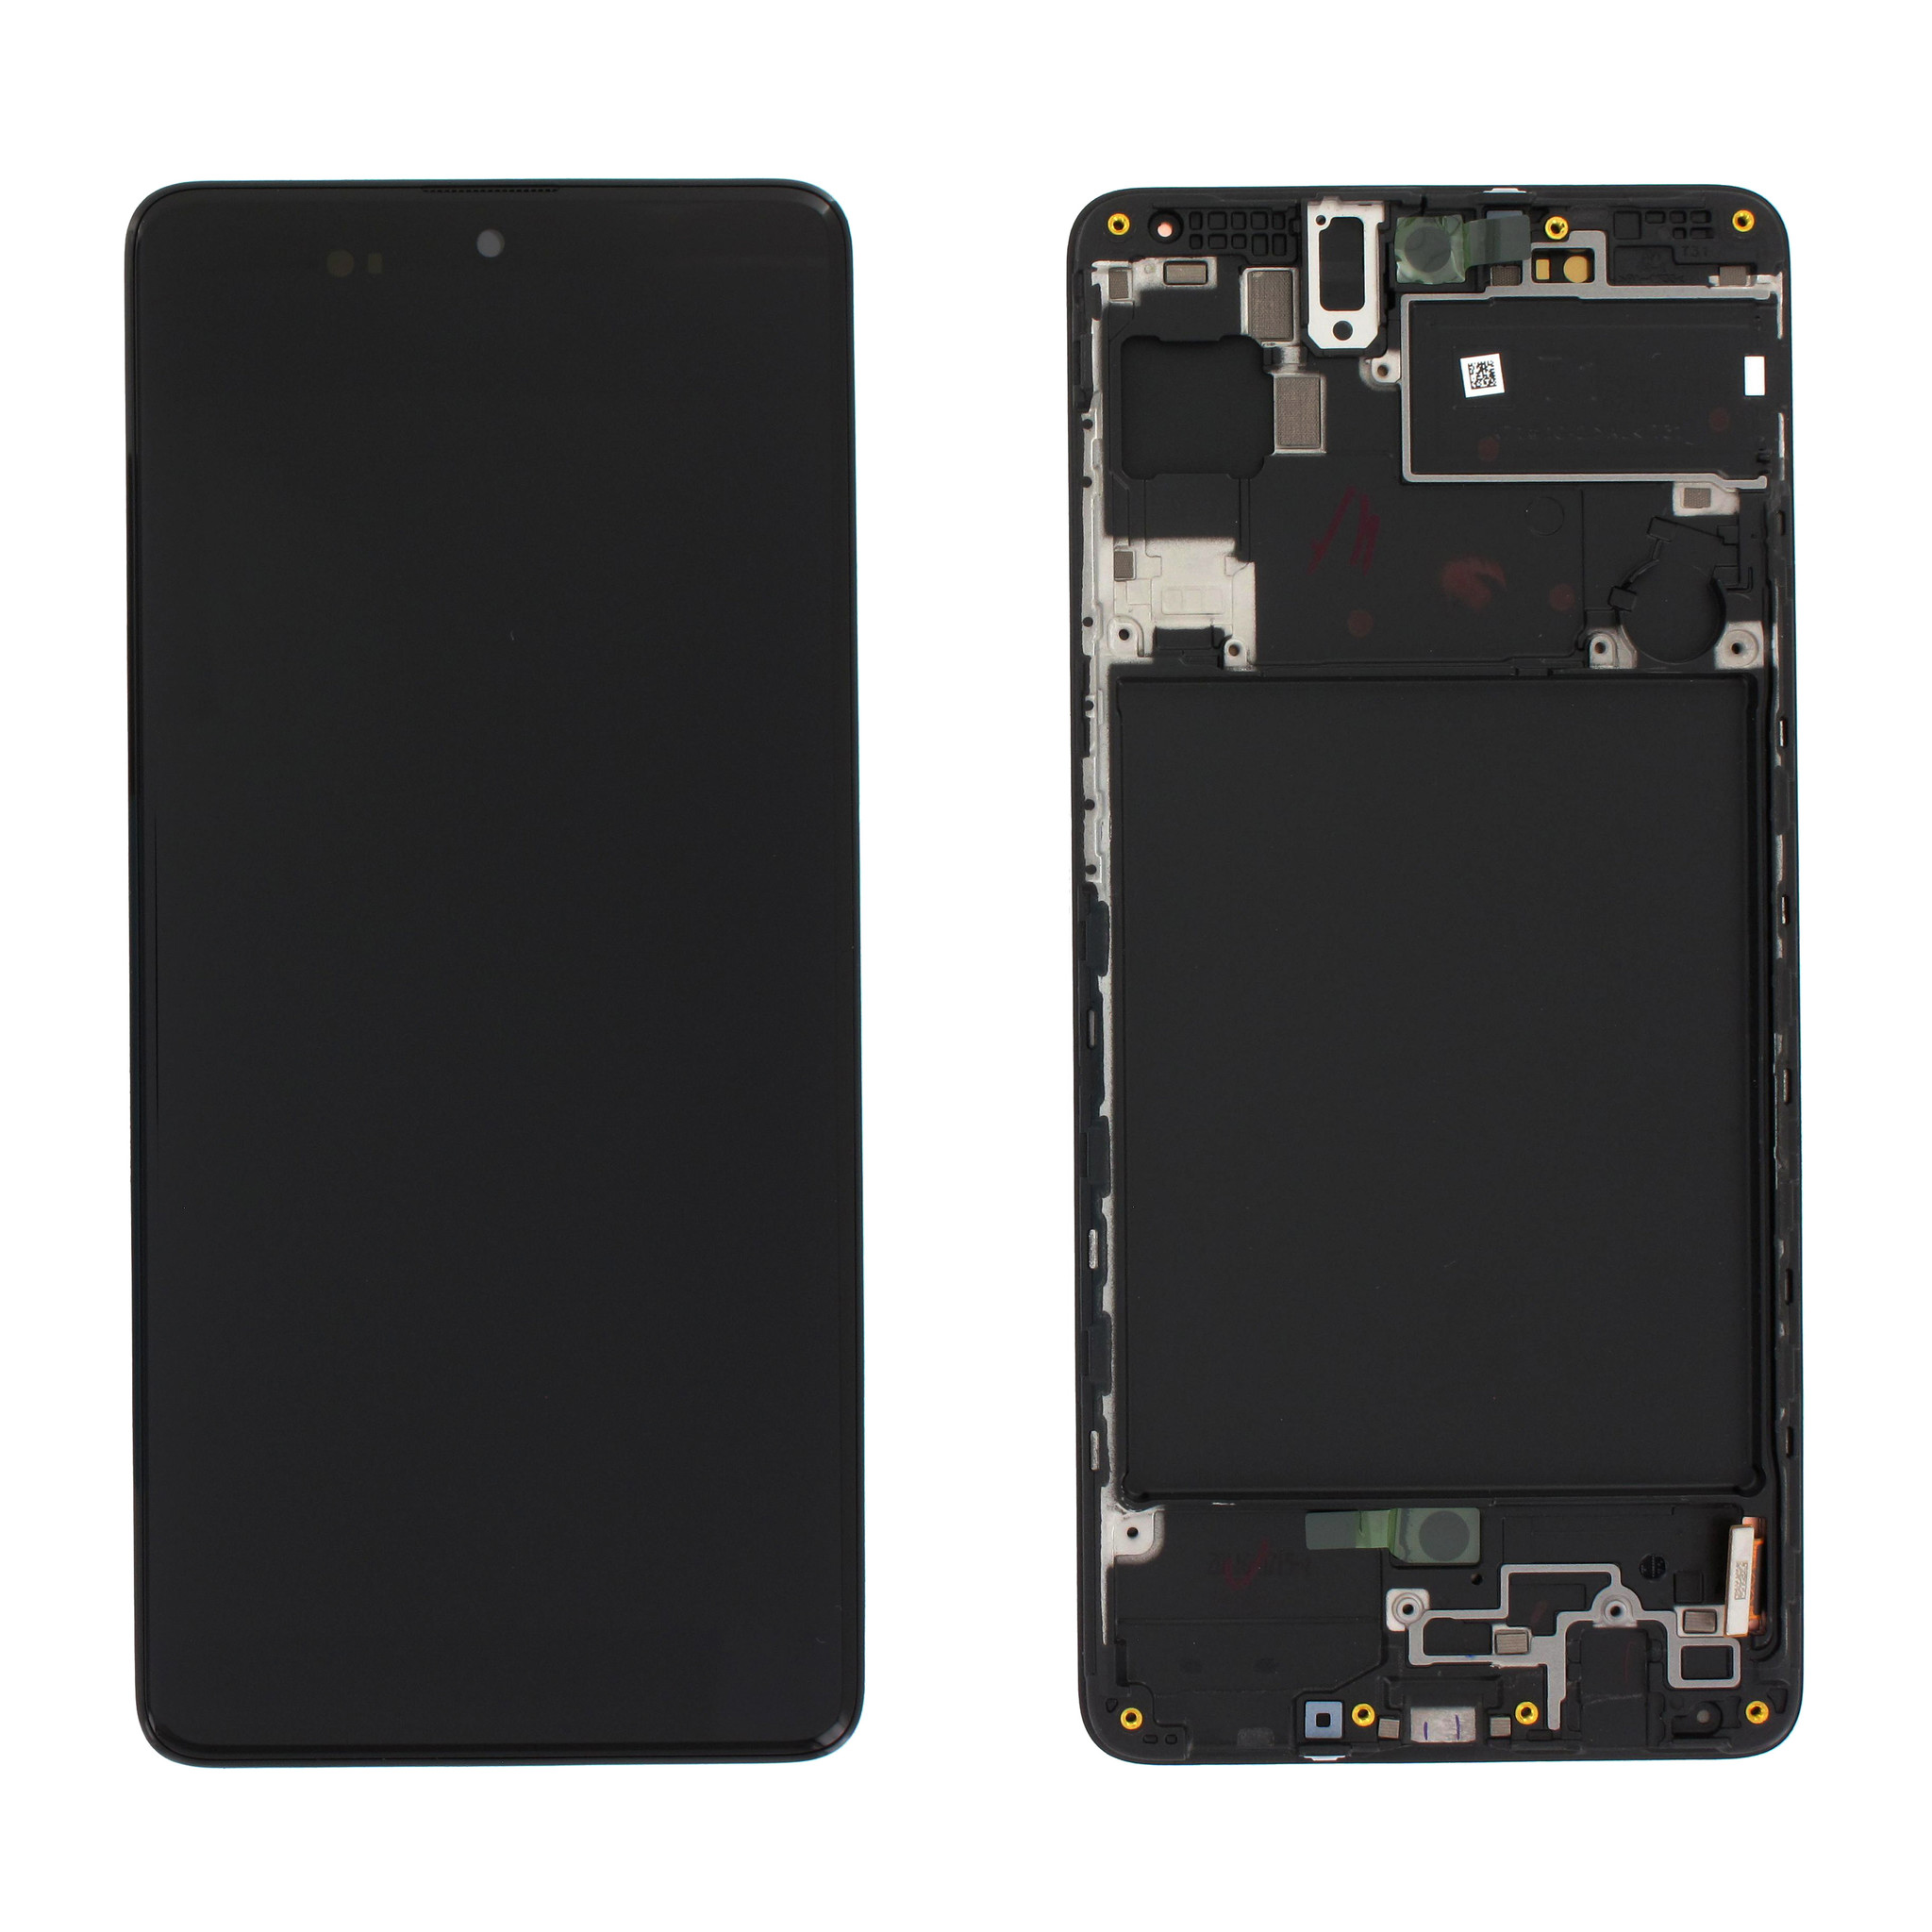 Samsung A715FN/DS Galaxy A71 Display, Schwarz, GH82-22152A;GH82-22248A